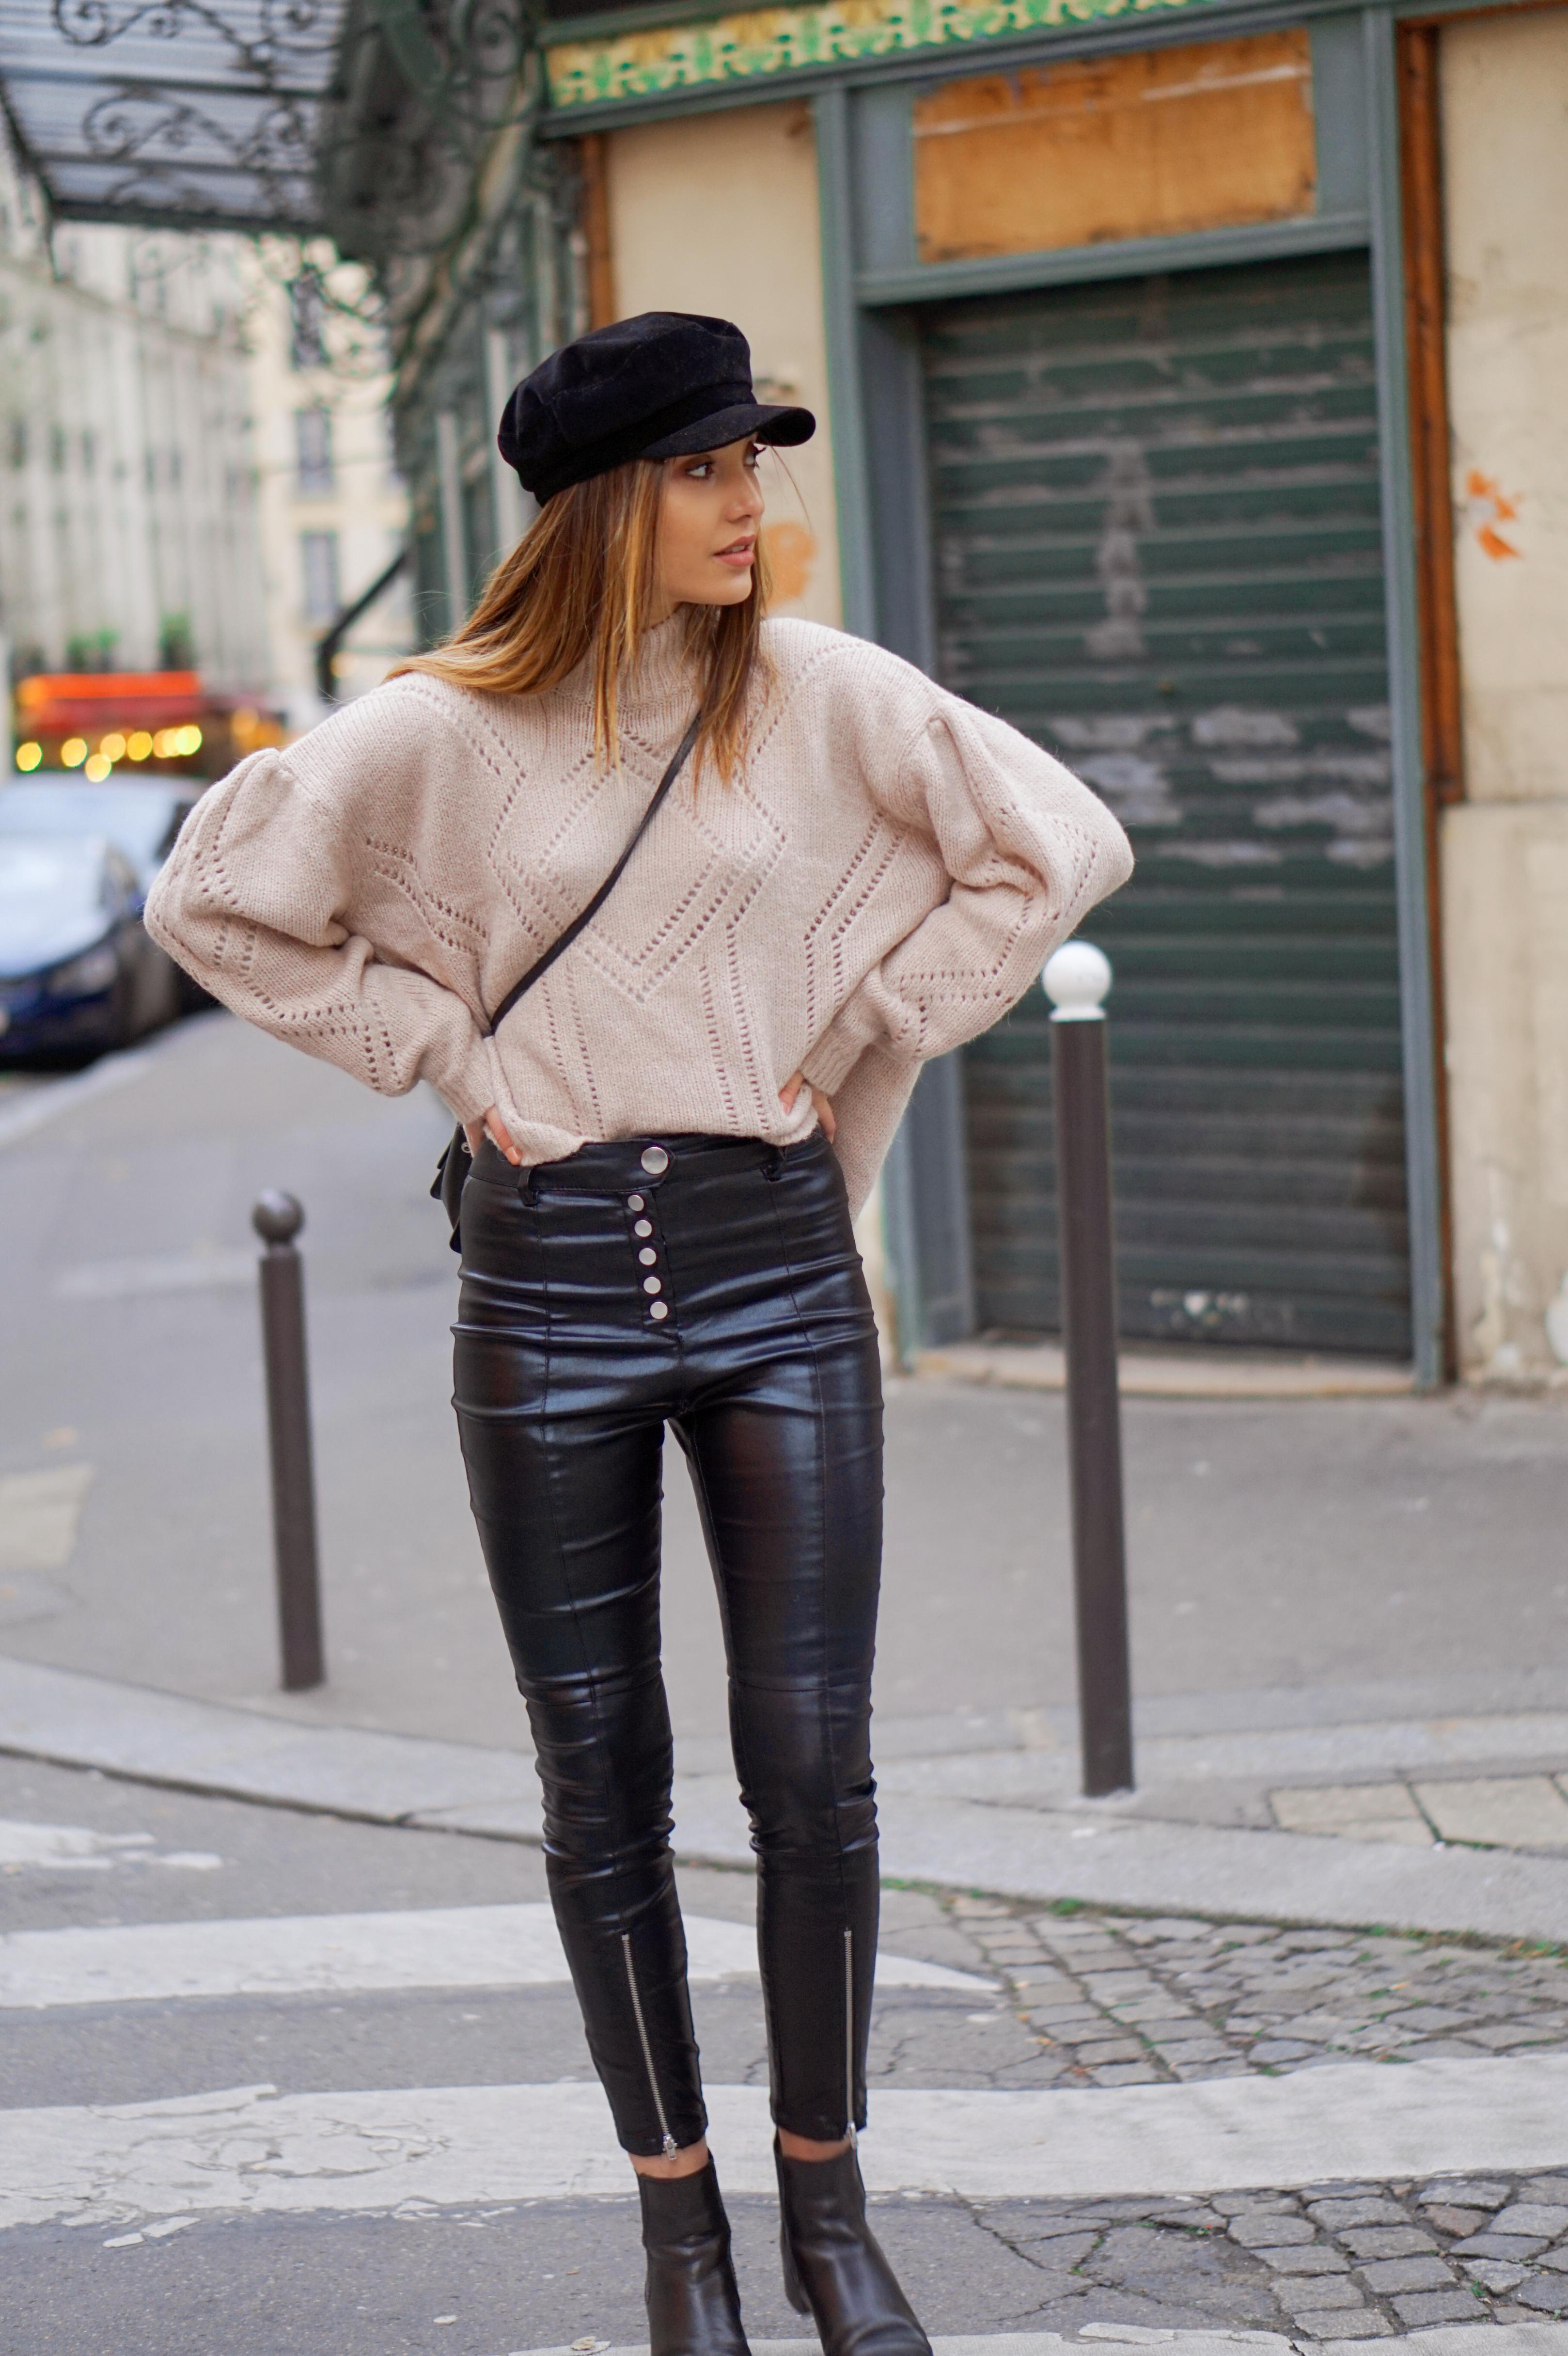 Le pantalon en simili cuir – WENDYSWAN 539377be565